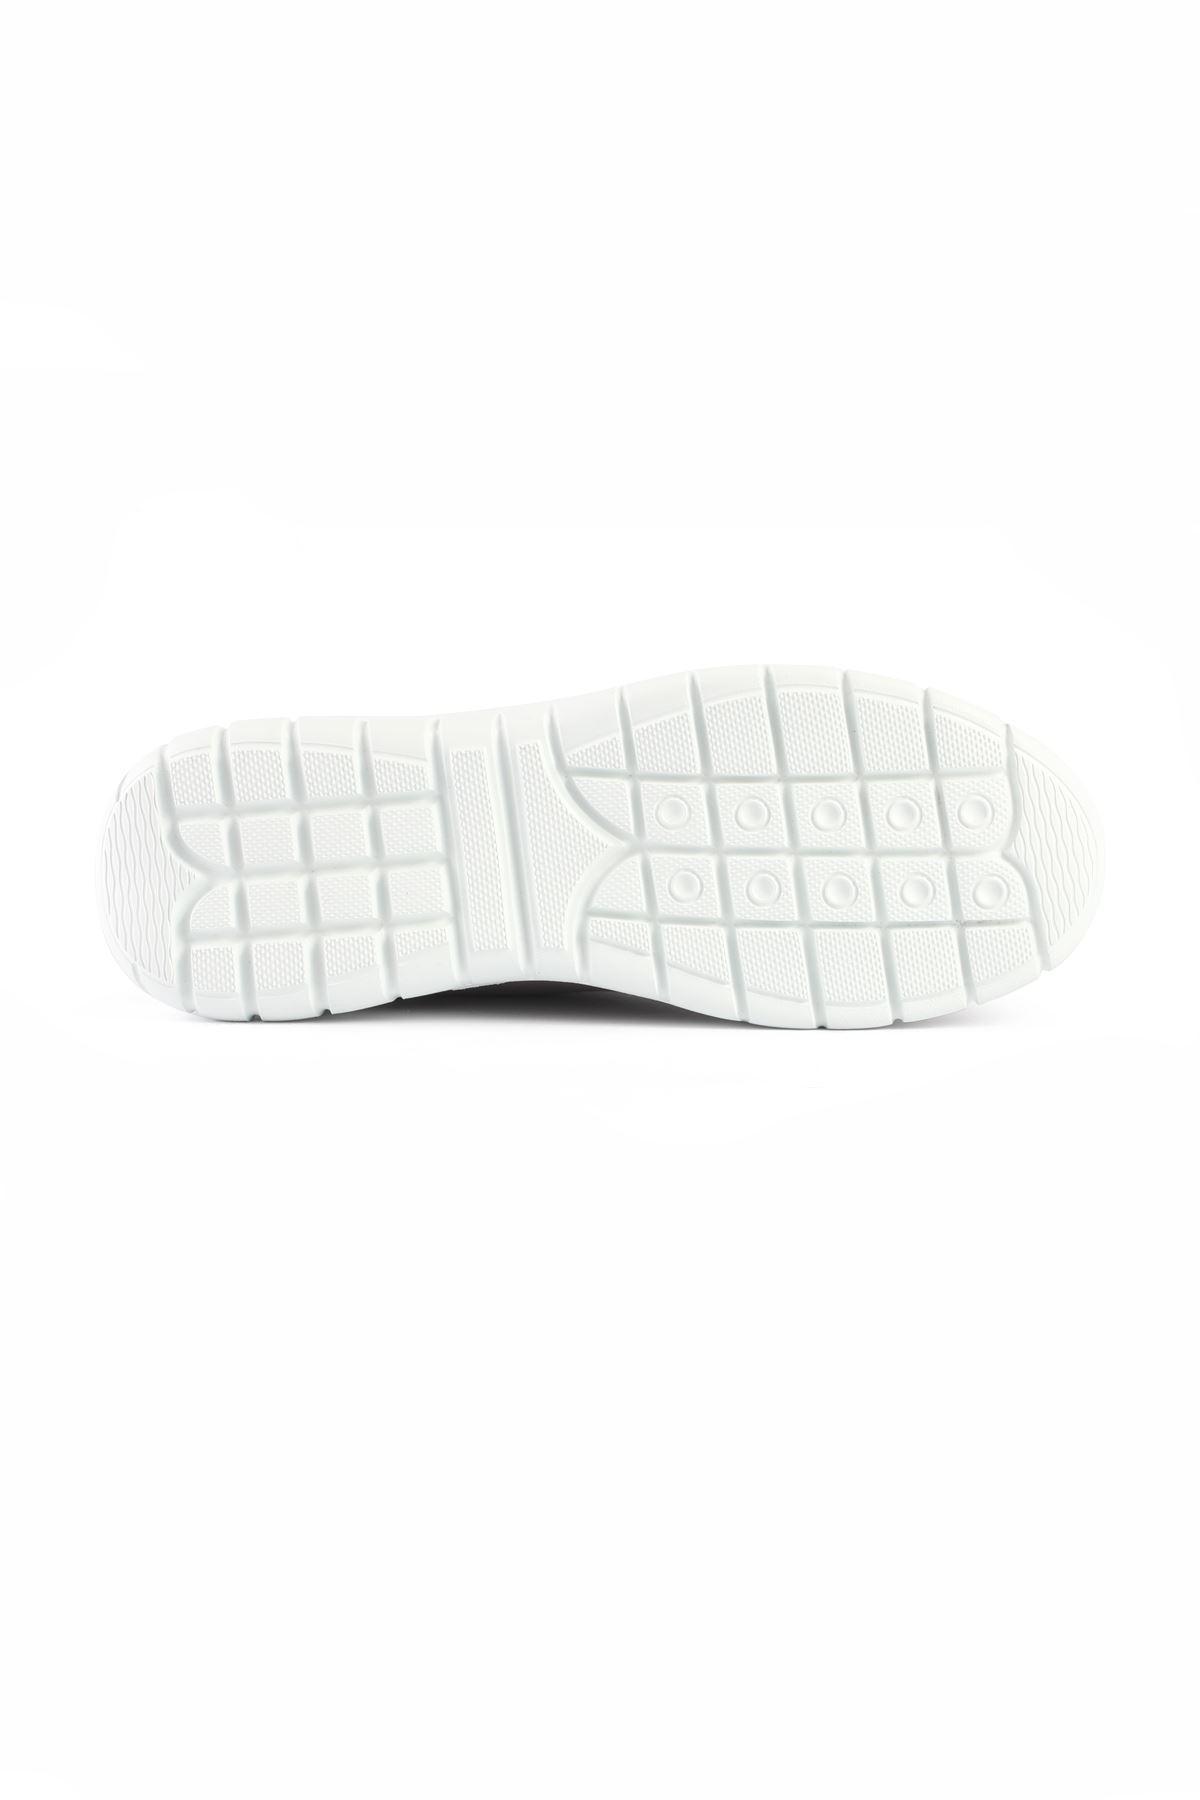 Libero LZ3414 Black Sports Shoes